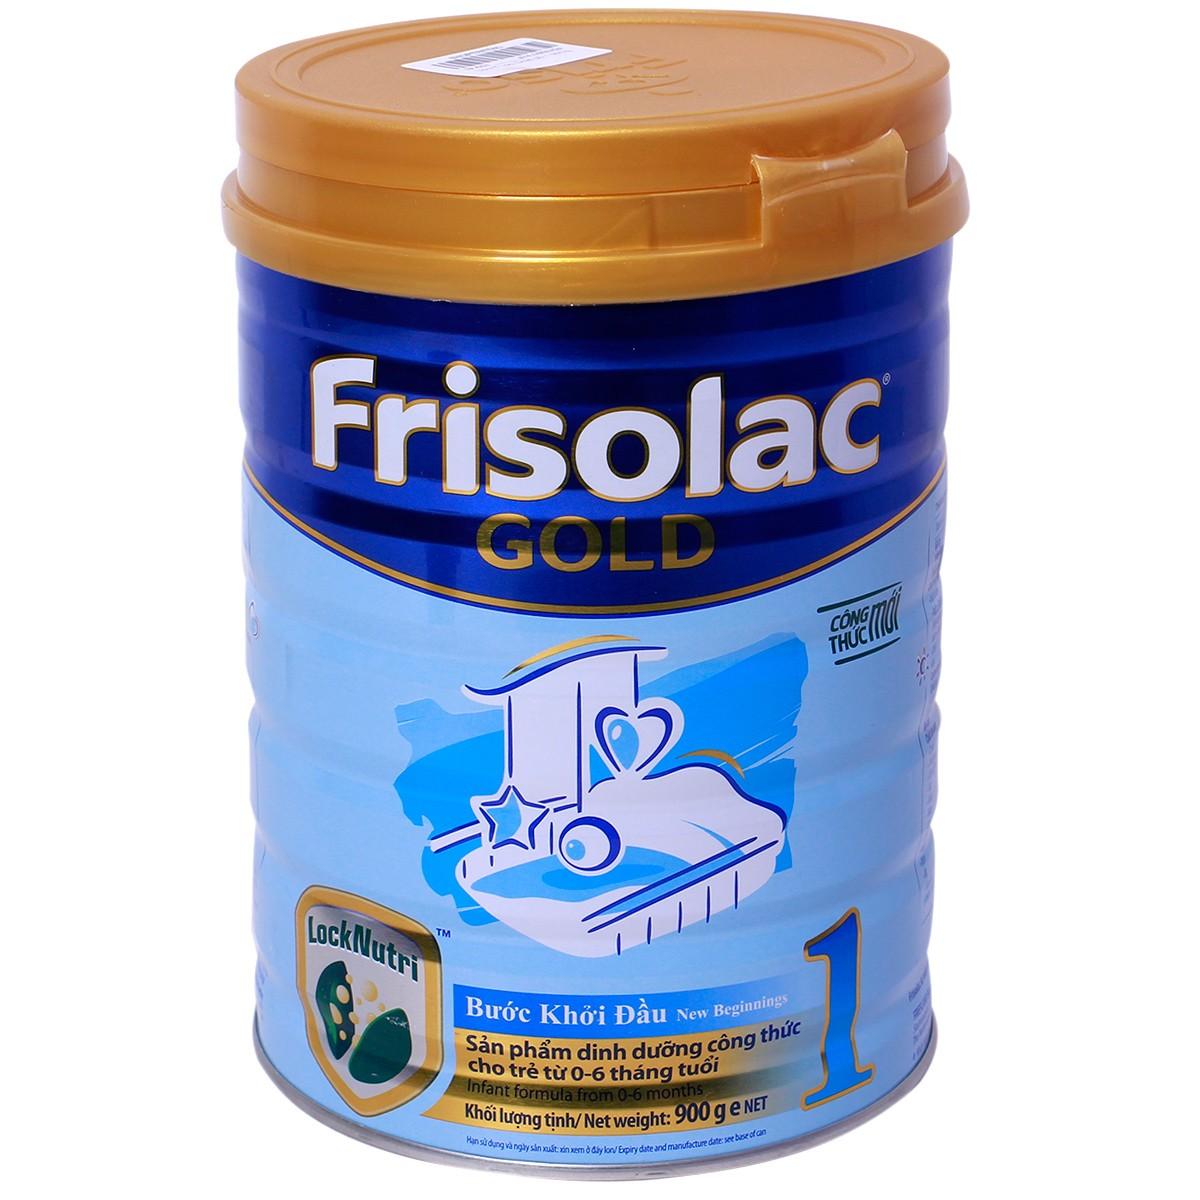 Sữa Frisolac Gold số 1,2,3,4, mom 400g, 900g, 1,5kg